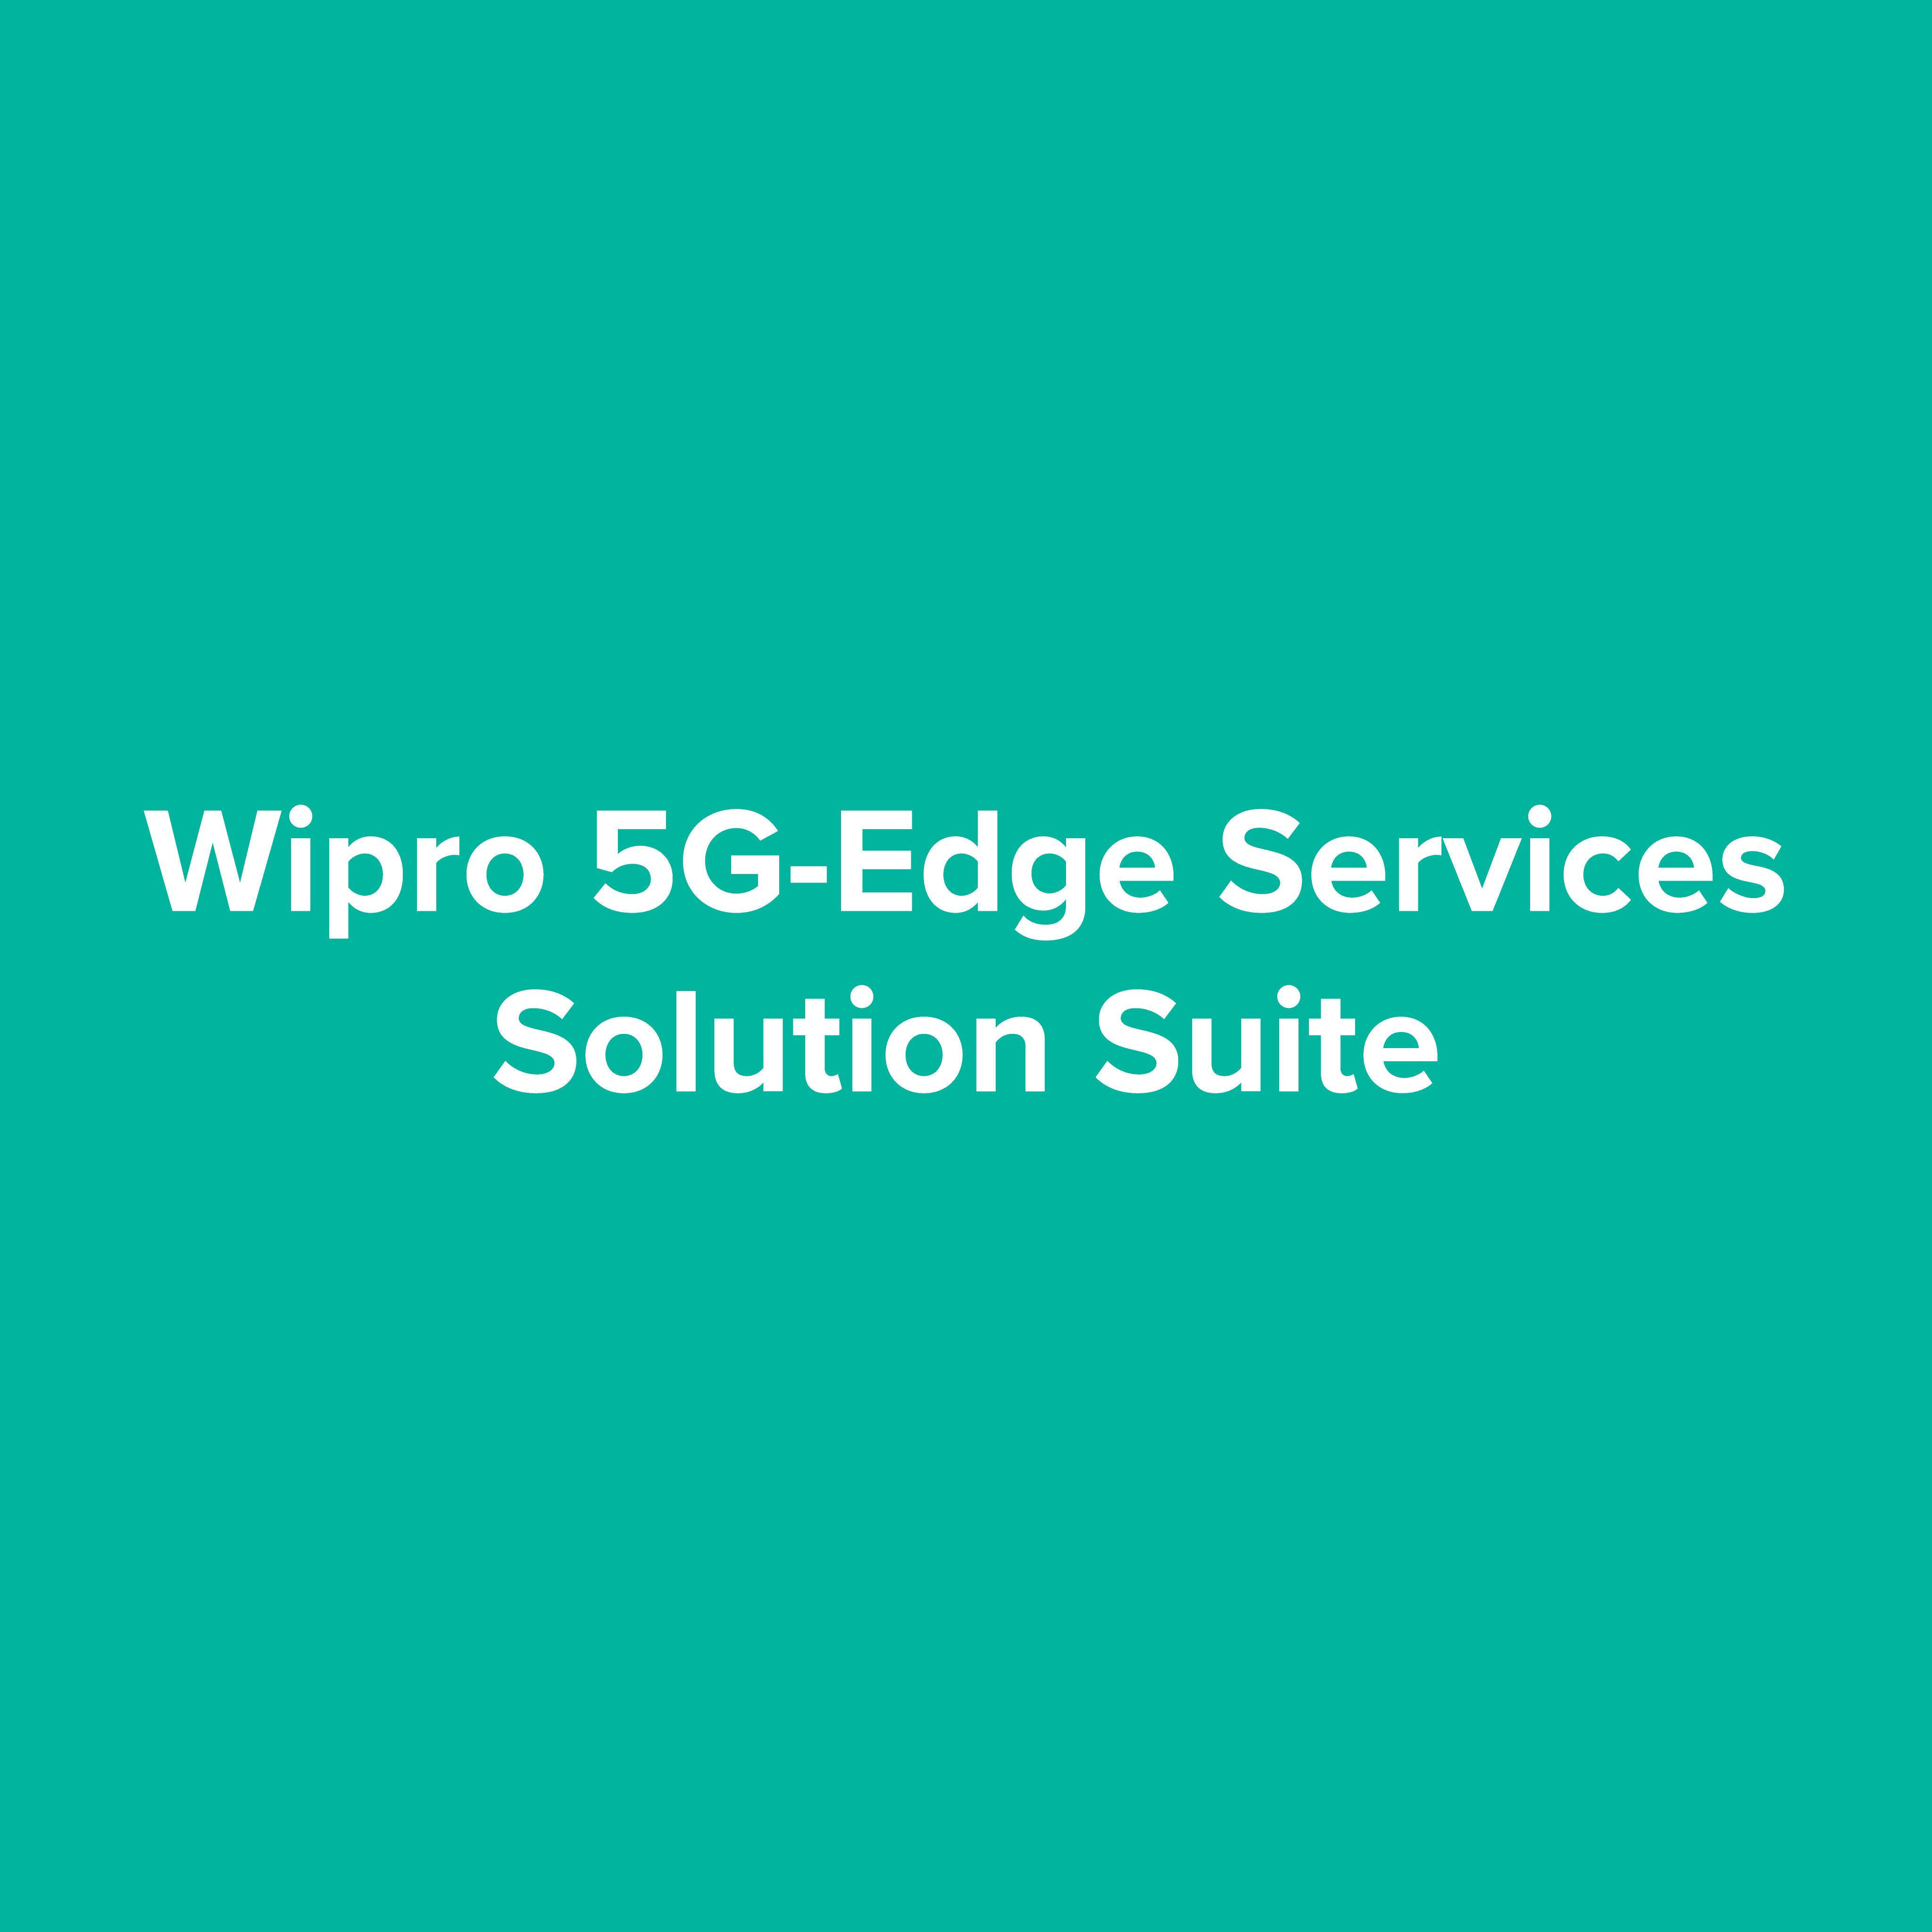 Wipro 5G-Edge Services Solution Suite